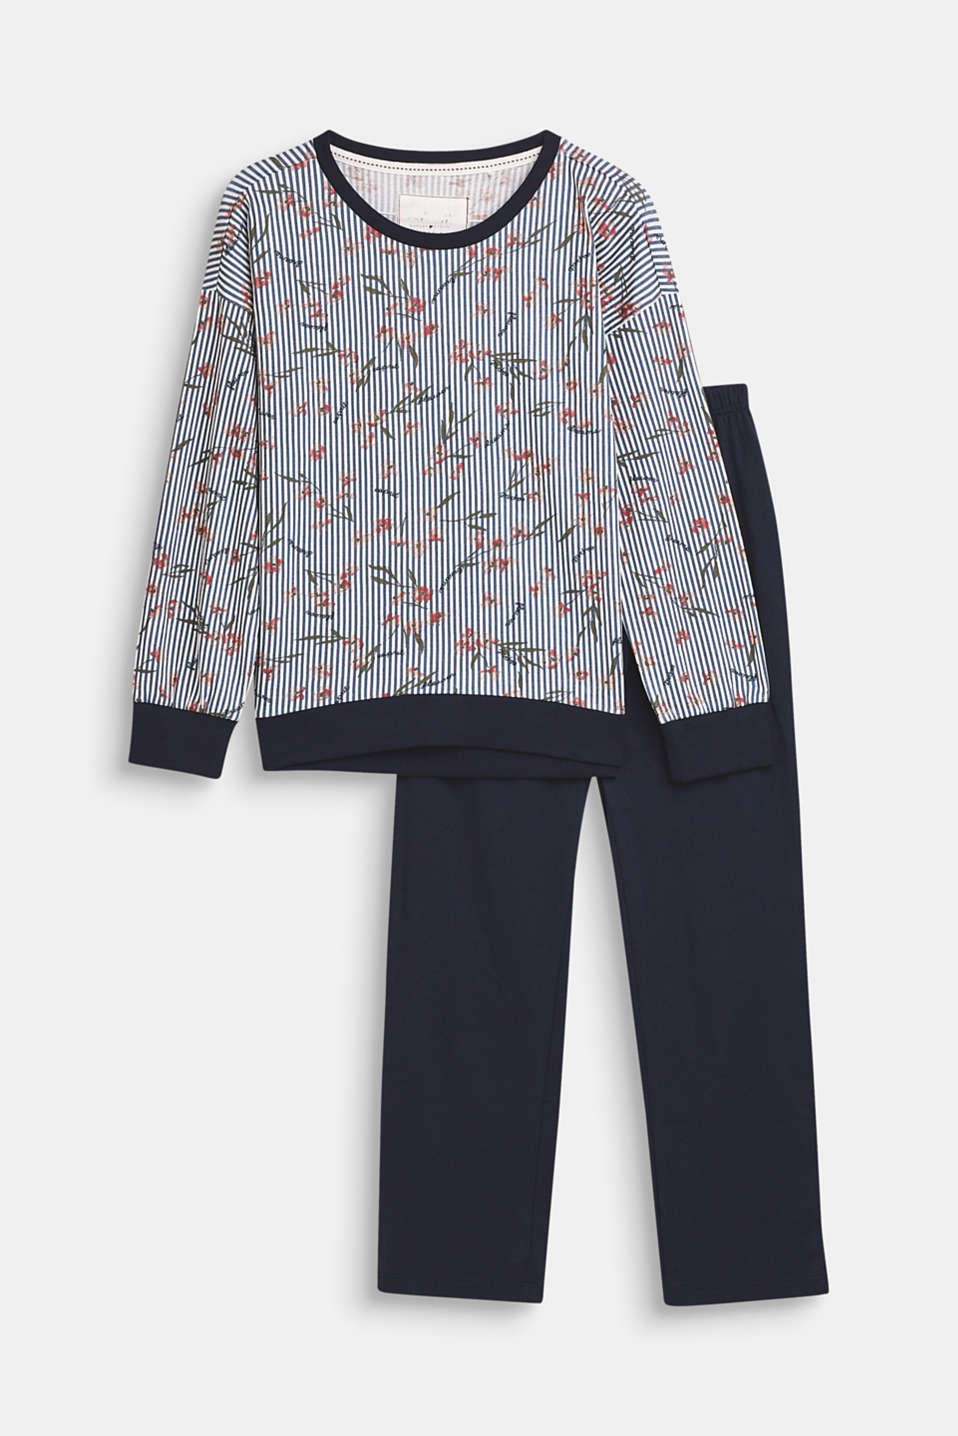 Printed jersey pyjamas, 100% cotton, NAVY, detail image number 0